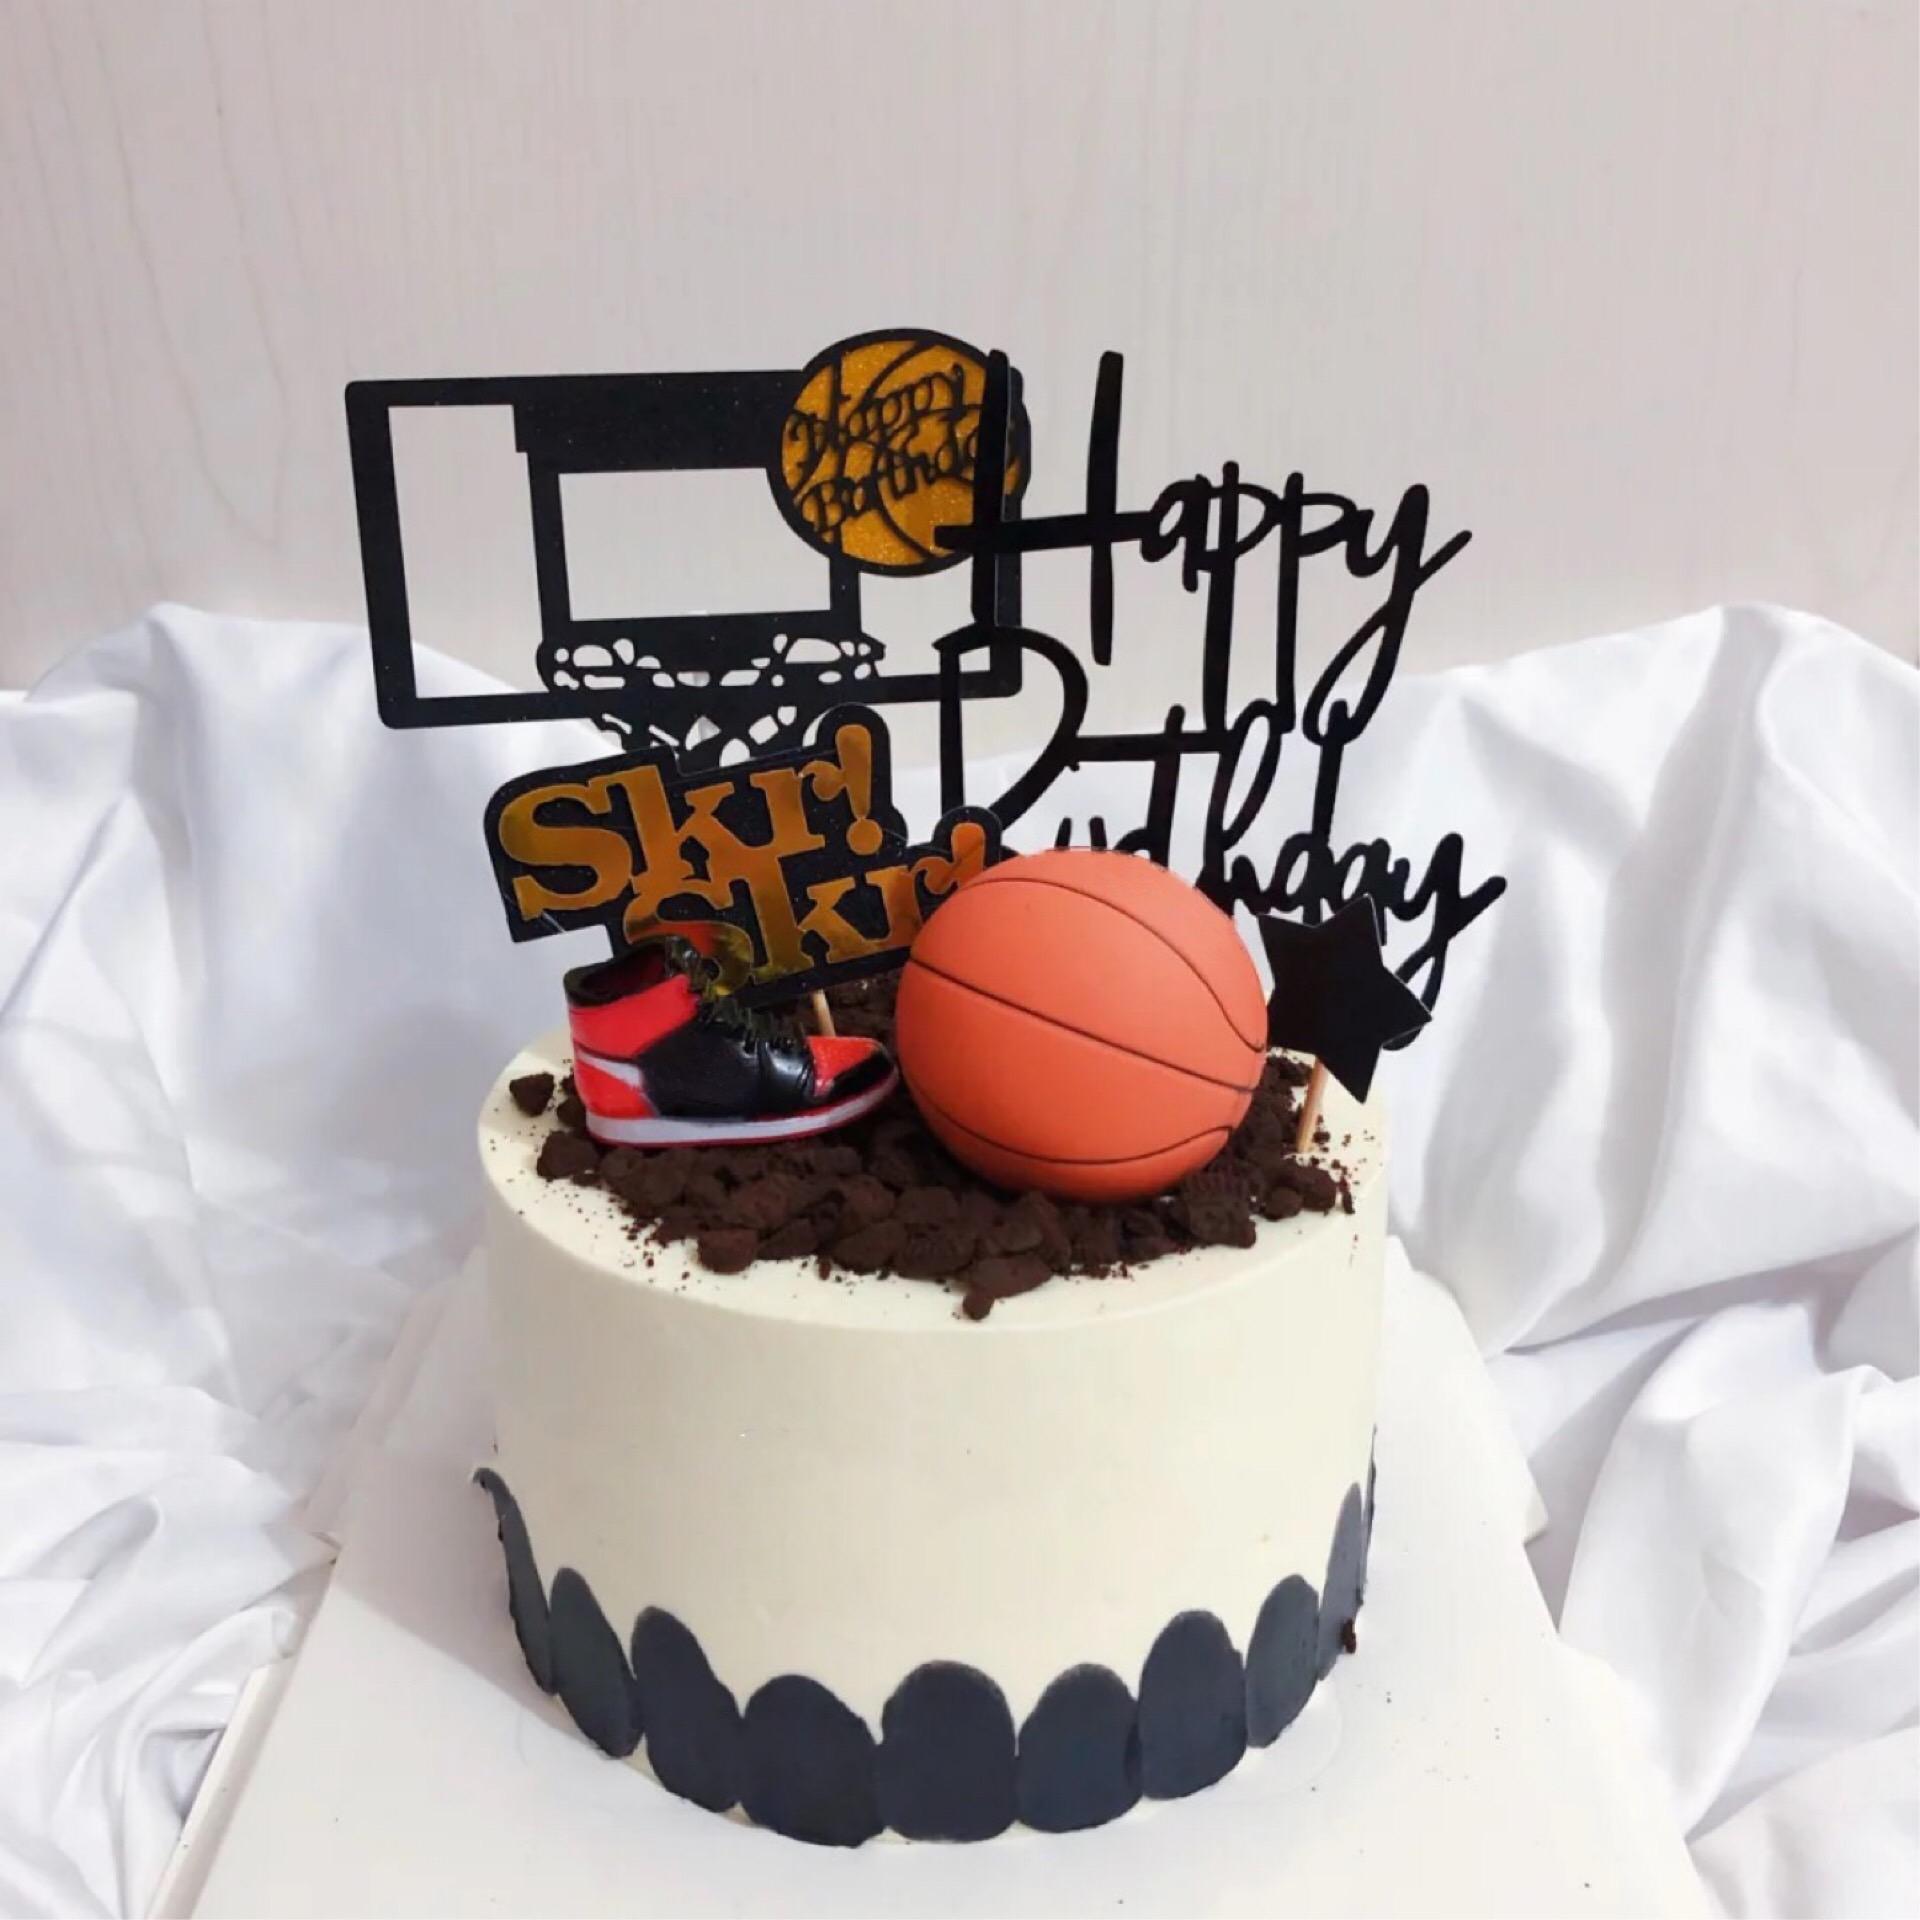 Cake decoration mini basketball shoes athlete boy God birthday party theme dessert table dress up